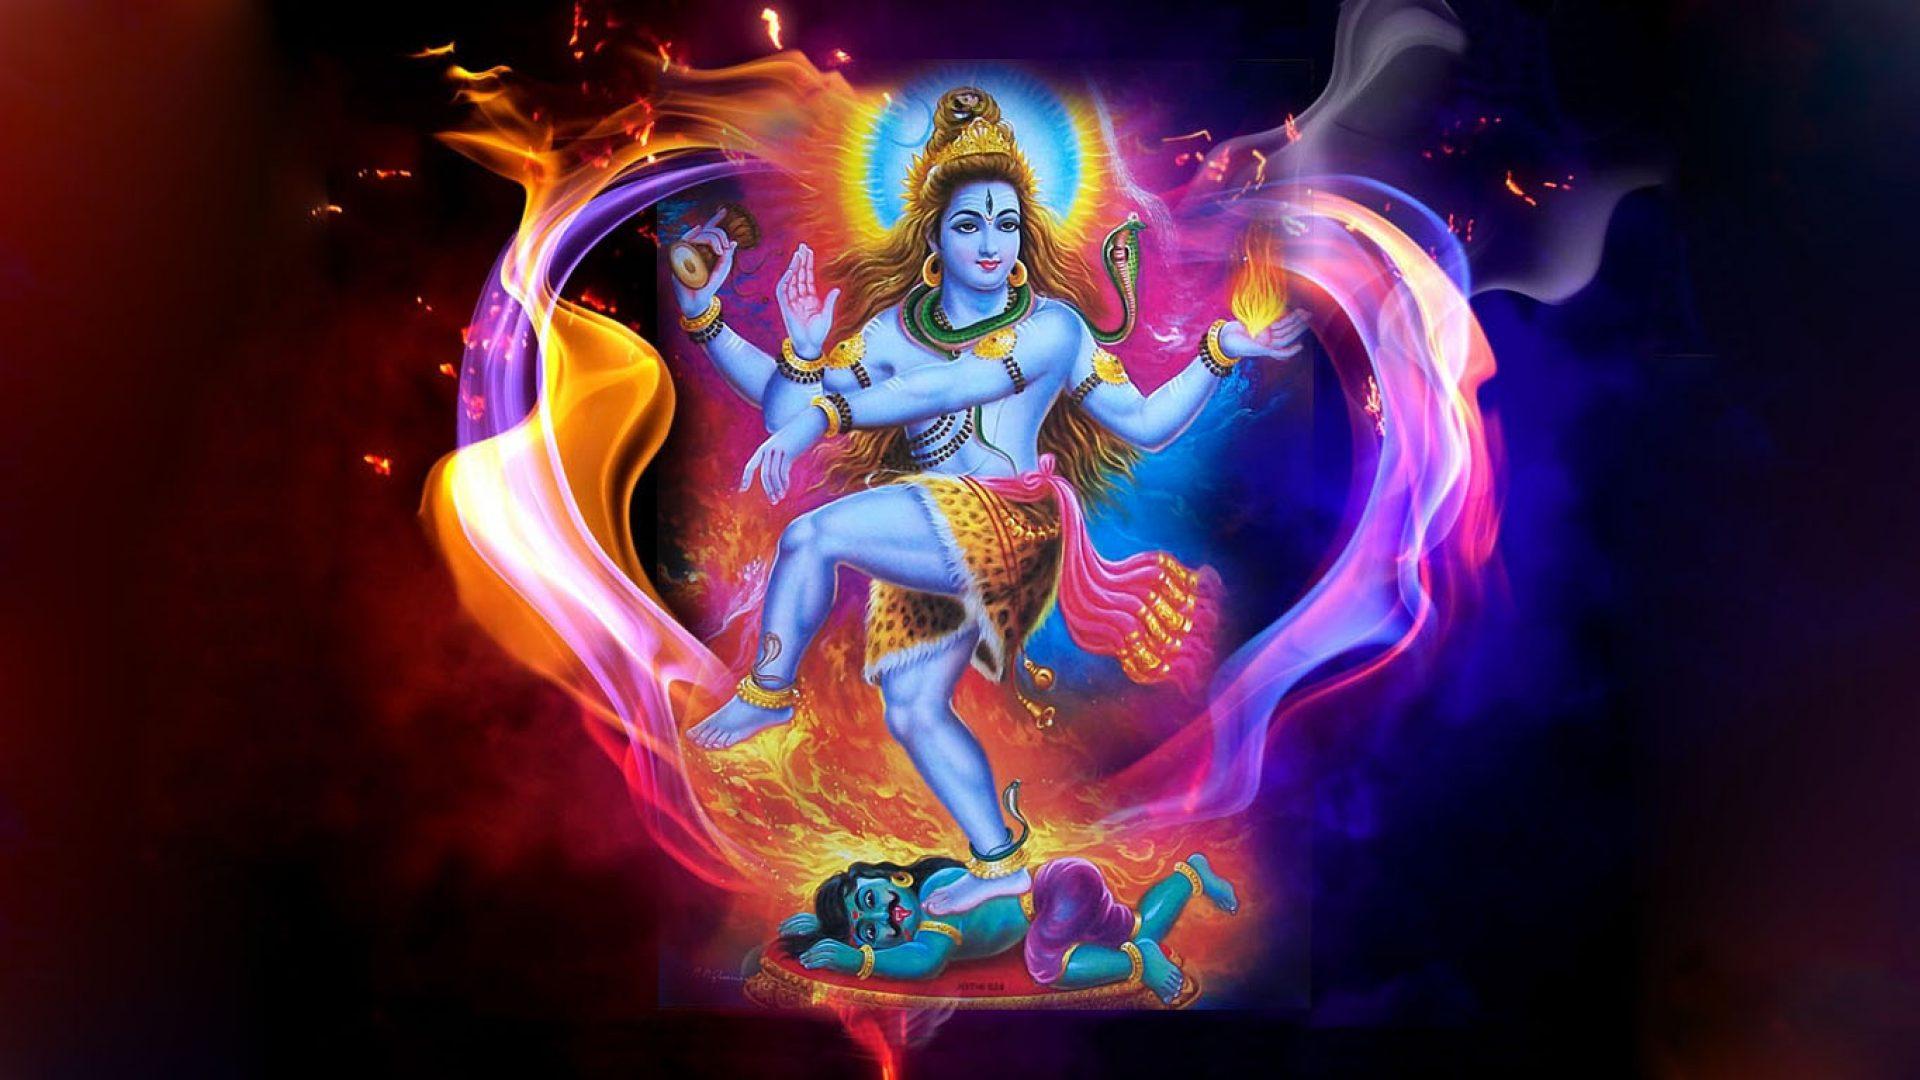 Rudra Shiva Hd Wallpaper Shiv Tandav Wallpaper Download Hindu Gods And Goddesses